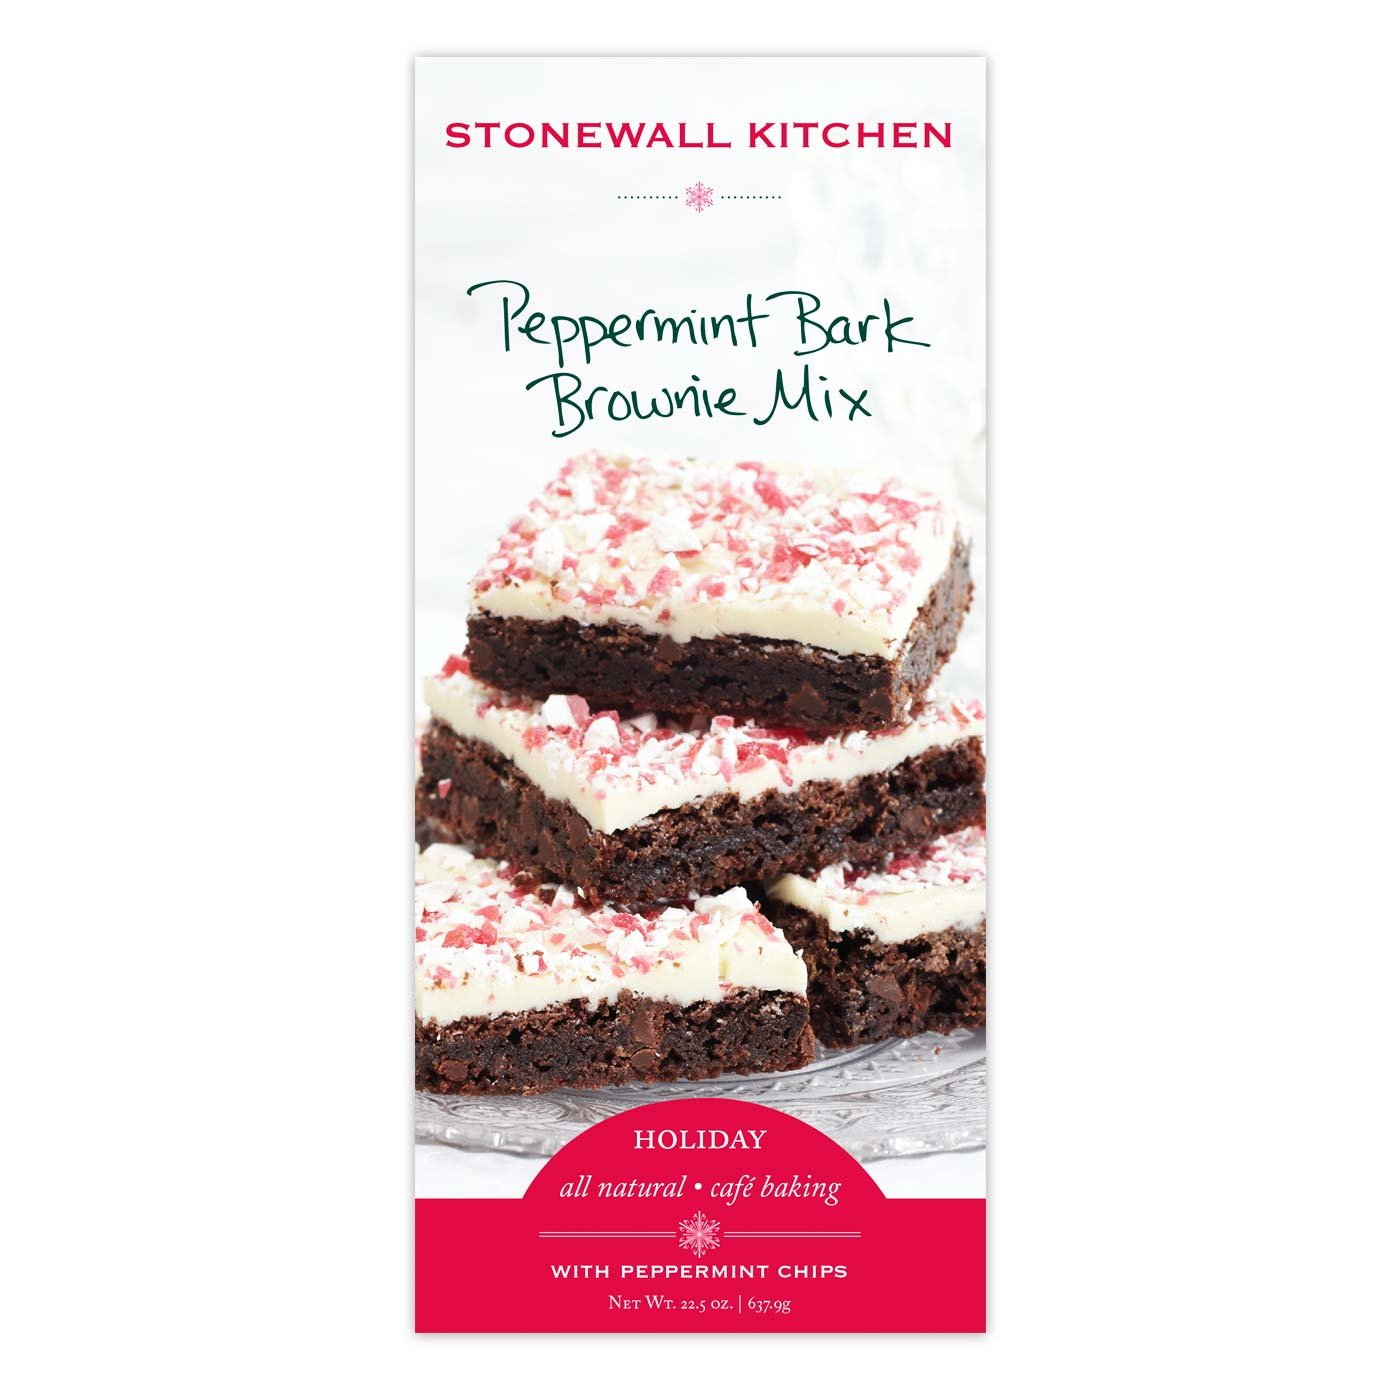 Stonewall Kitchen Chocolate Peppermint Brownie Mix